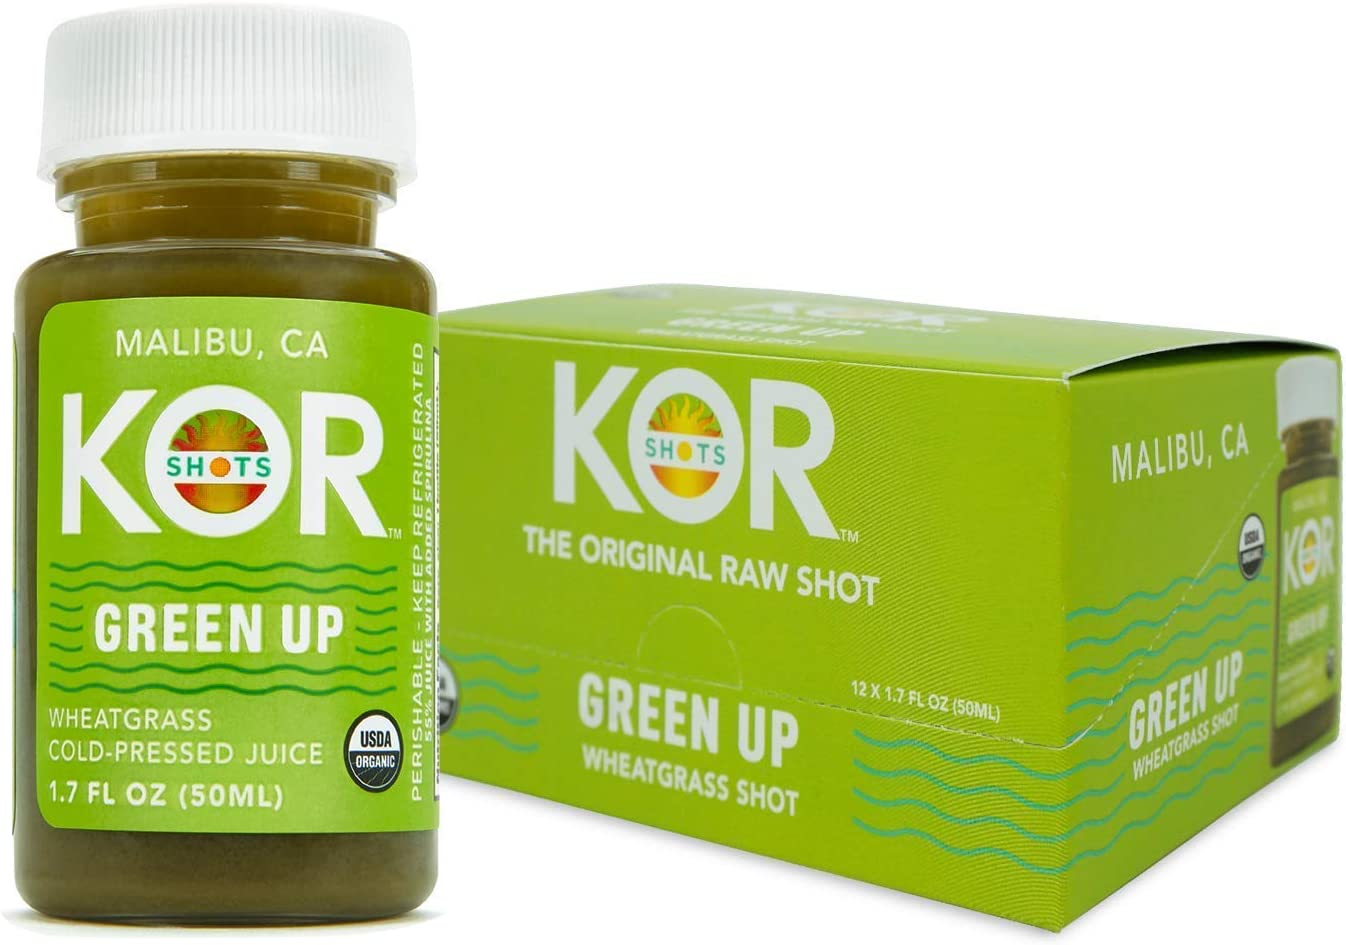 KOR Shots Wheatgrass Ginger Spirulina Shot - 12 Pack x 1.7 Fl Oz - Green Up Shot - Daily Greens Superfoods Shot - USDA Certified Organic